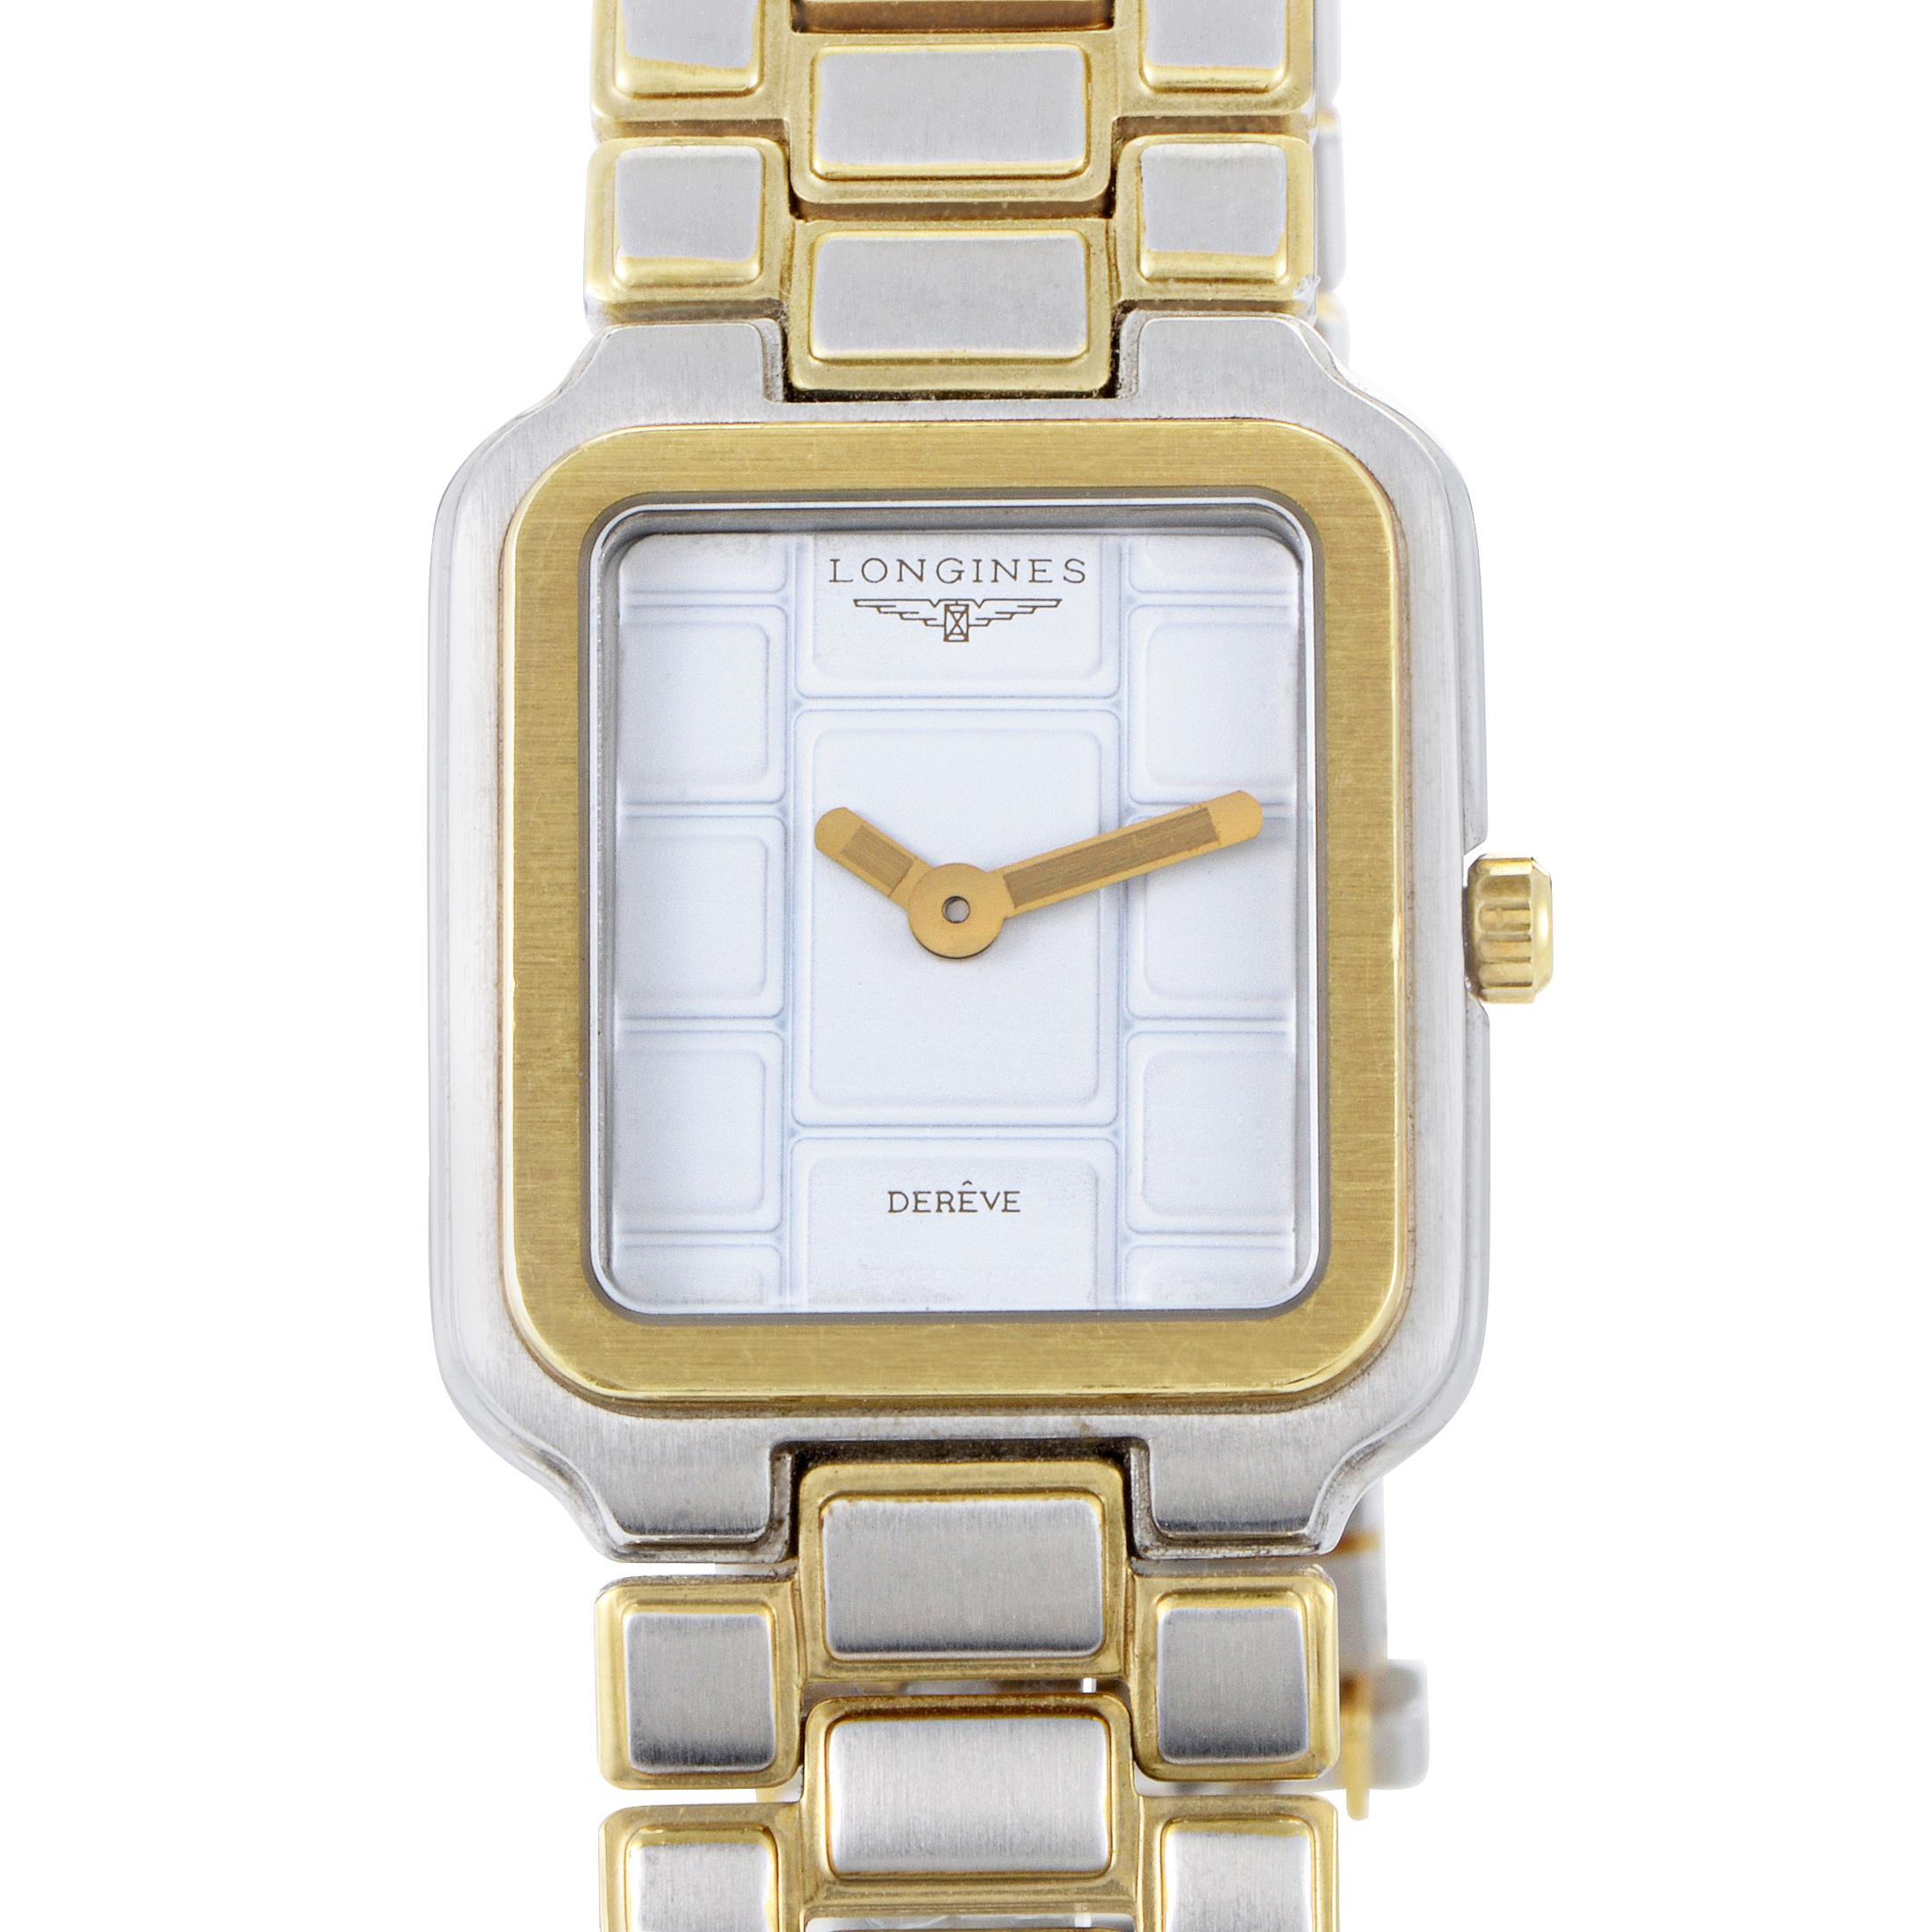 Derêve Women's Gold Plated Stainless Steel Quartz Watch L4.692.5.90.1